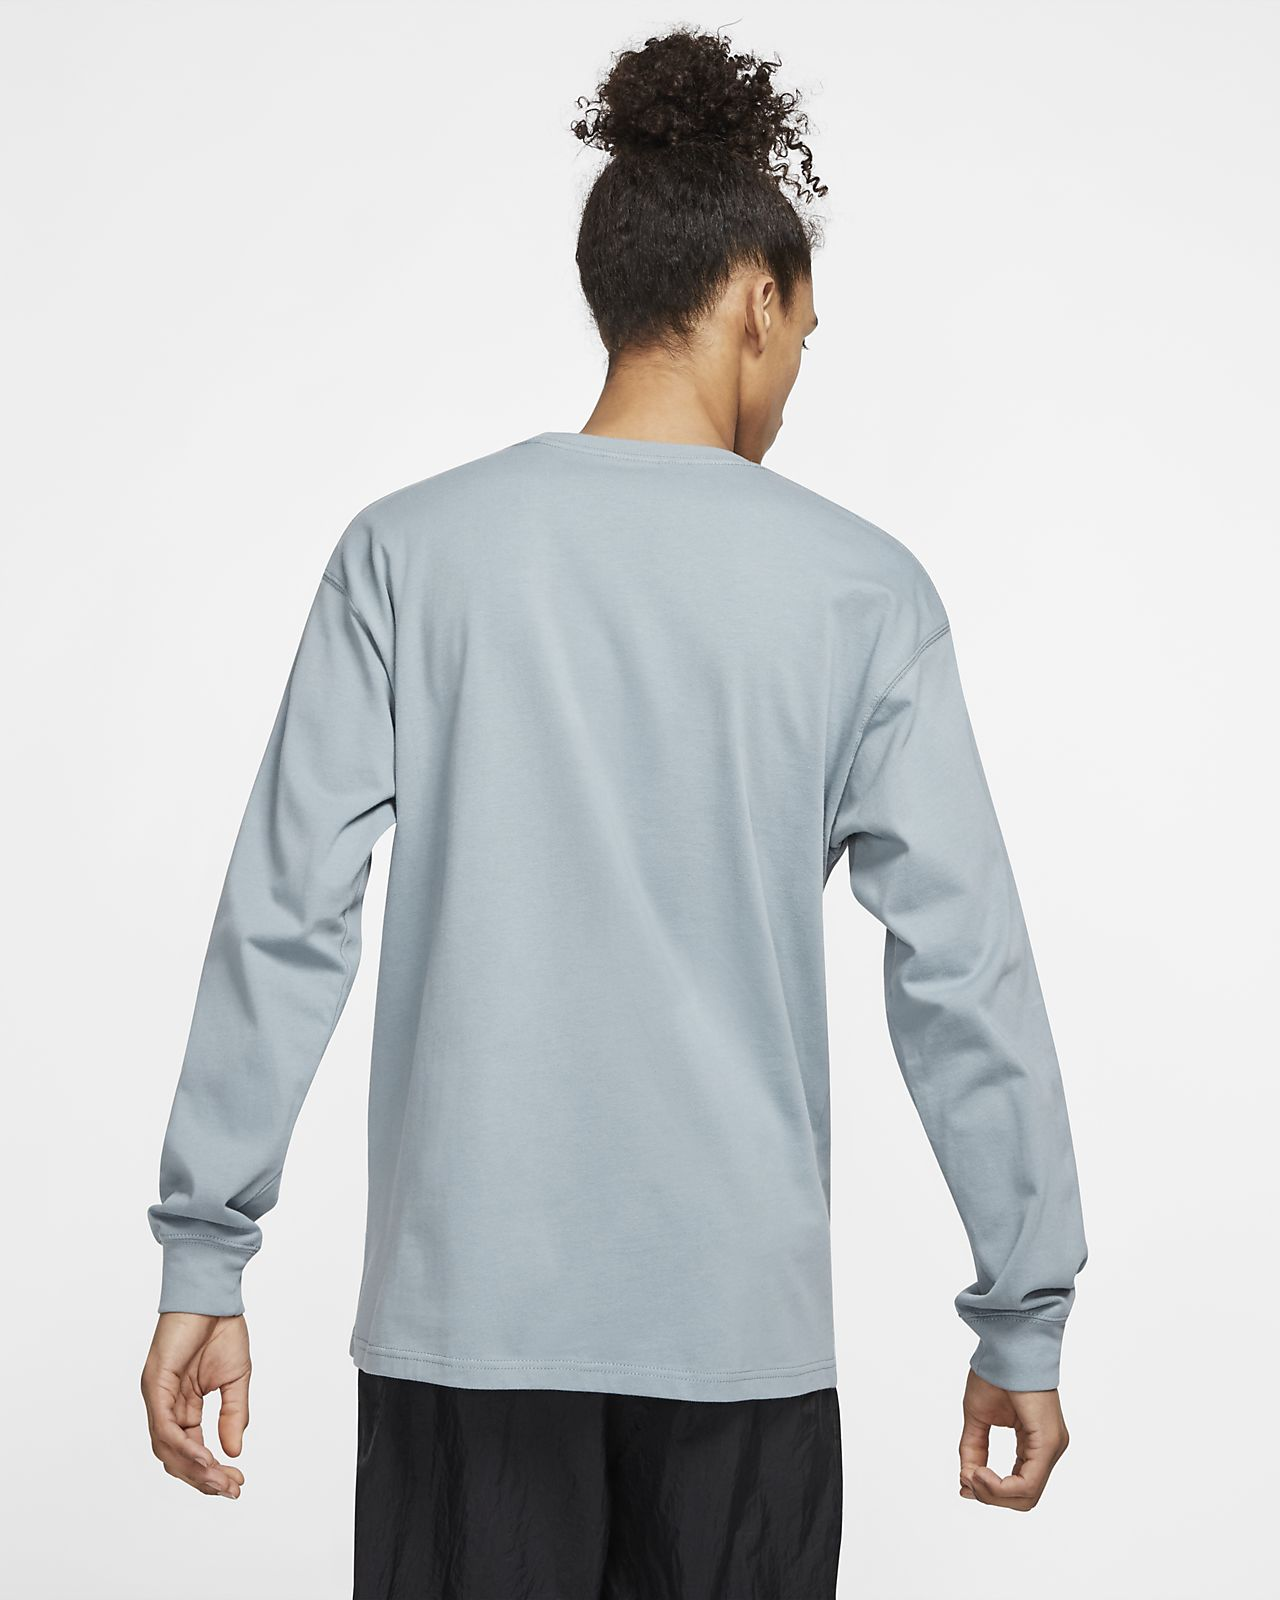 8f97e7e26 Nike ACG Long-Sleeve T-Shirt. Nike.com GB